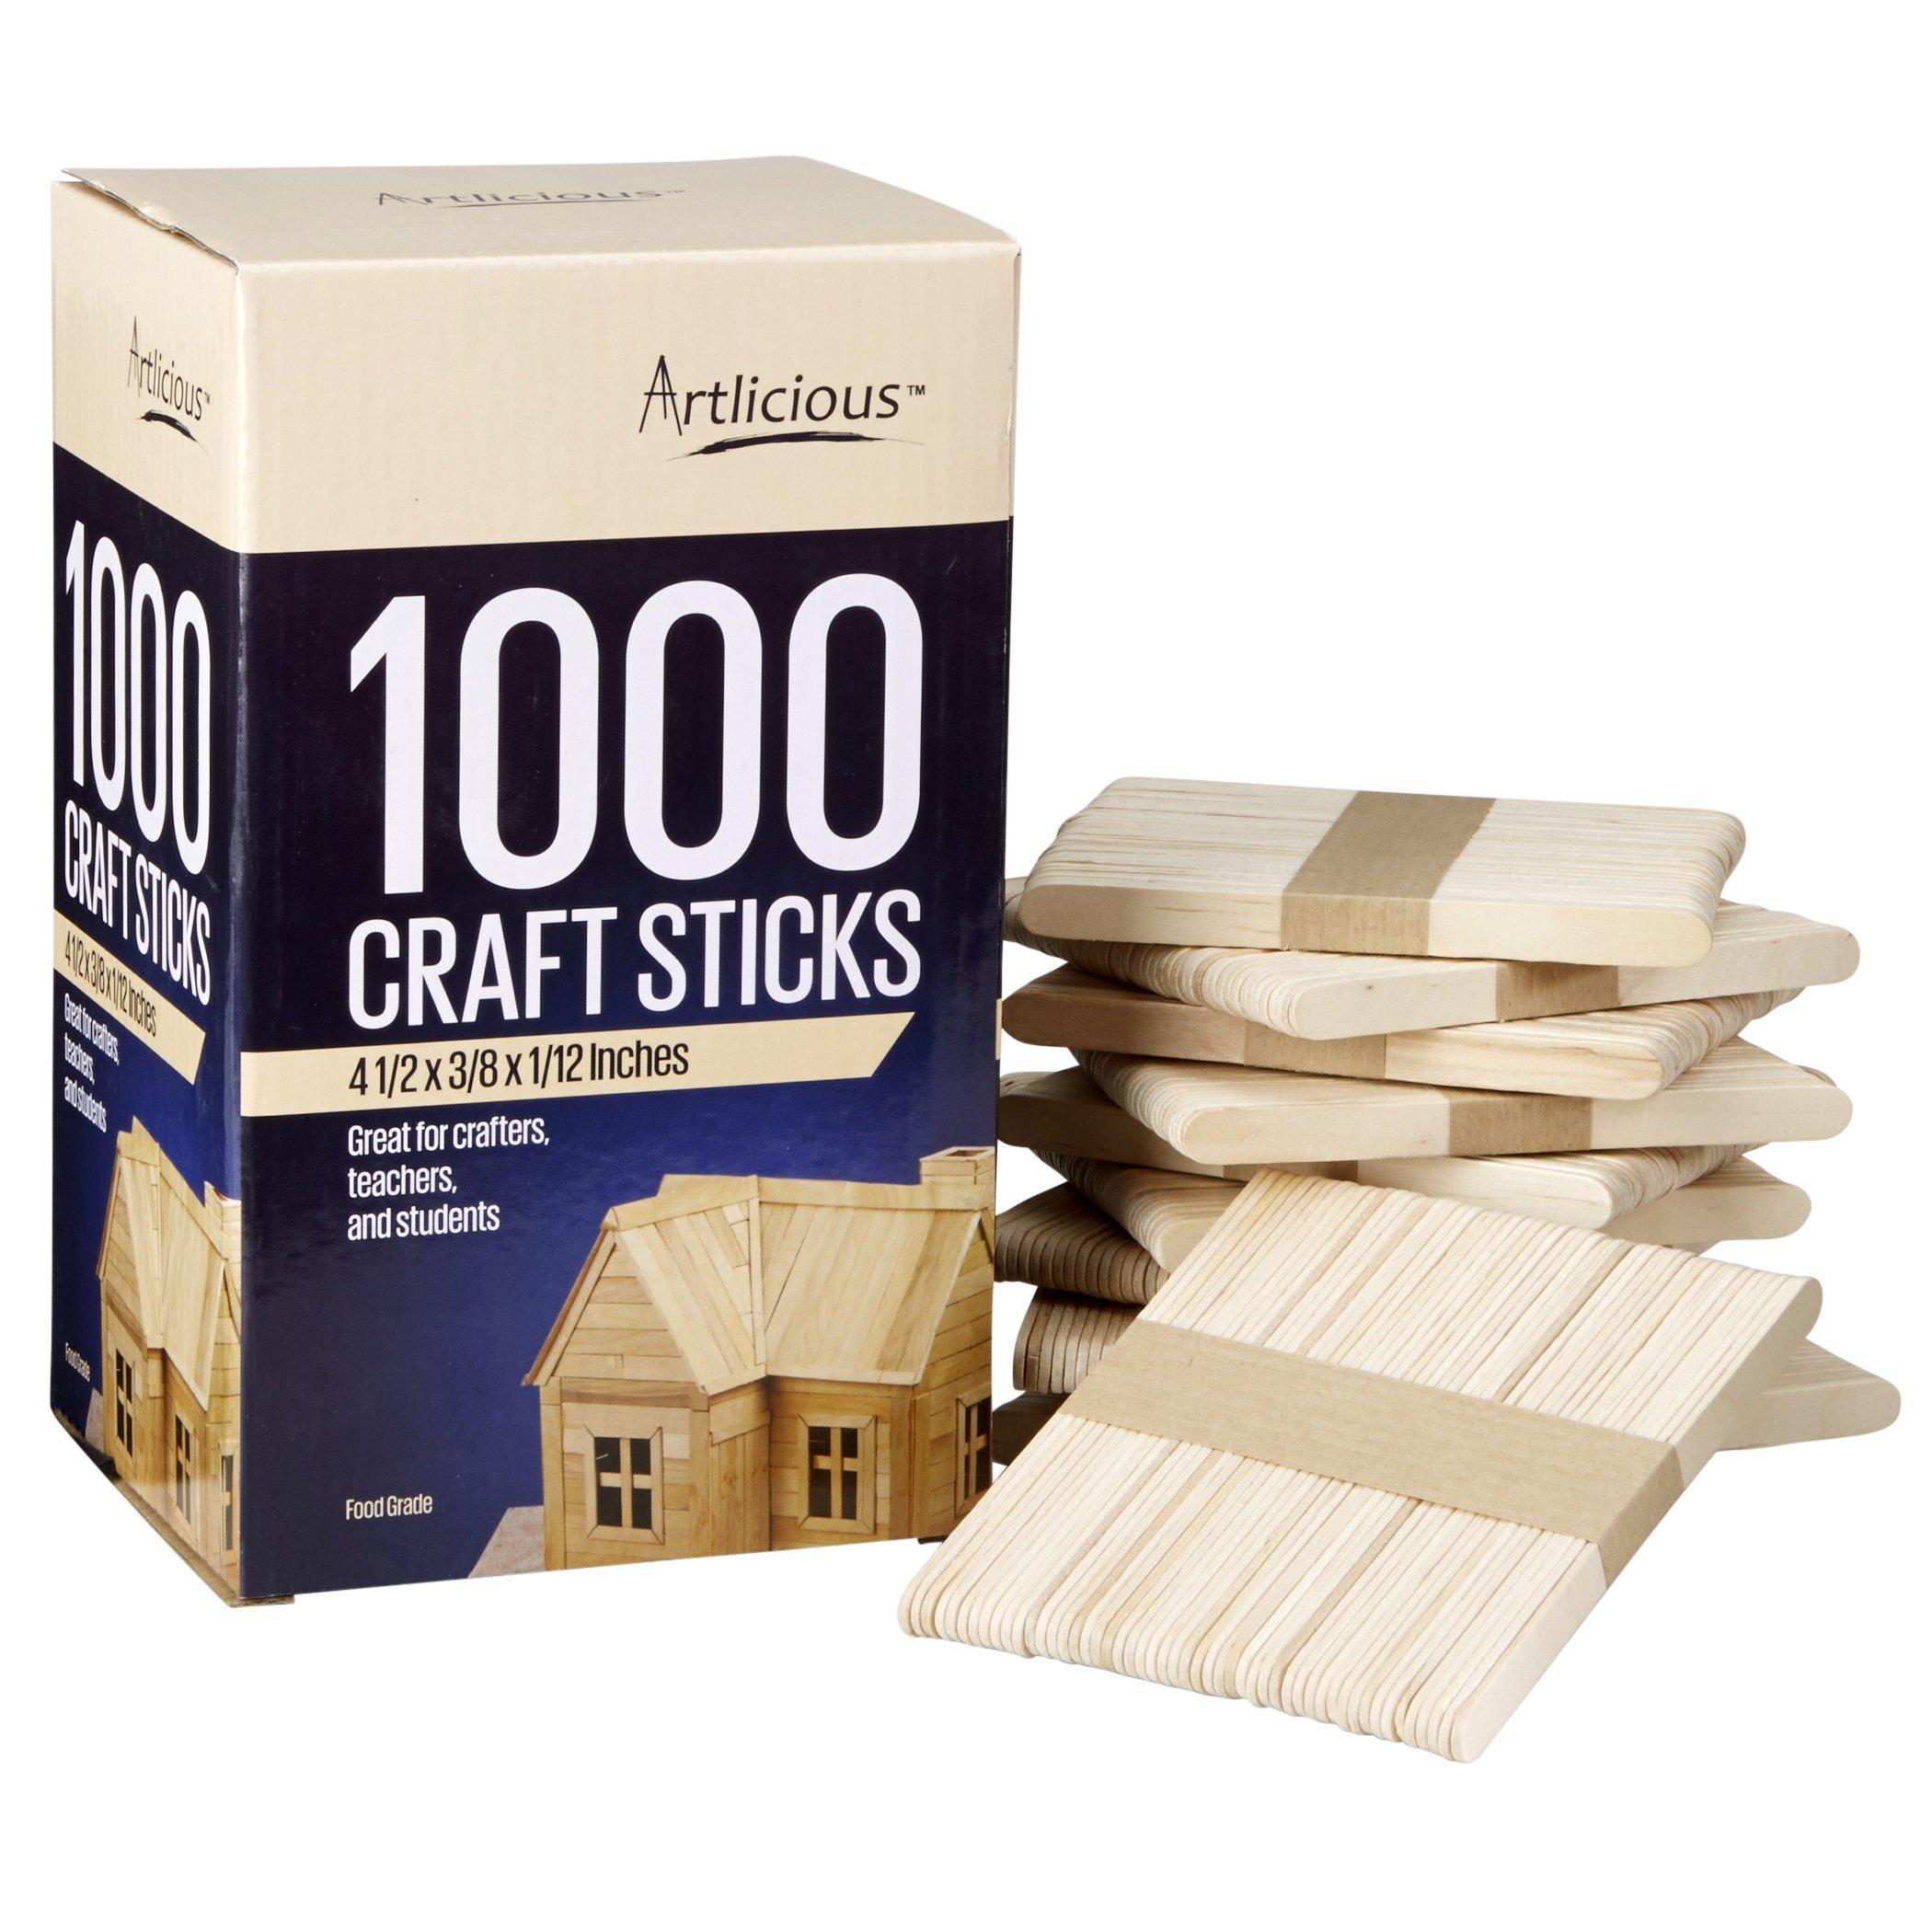 Details About Artlicious Natural Wooden Food Grade Popsicle Craft Sticks 1000 Sticks